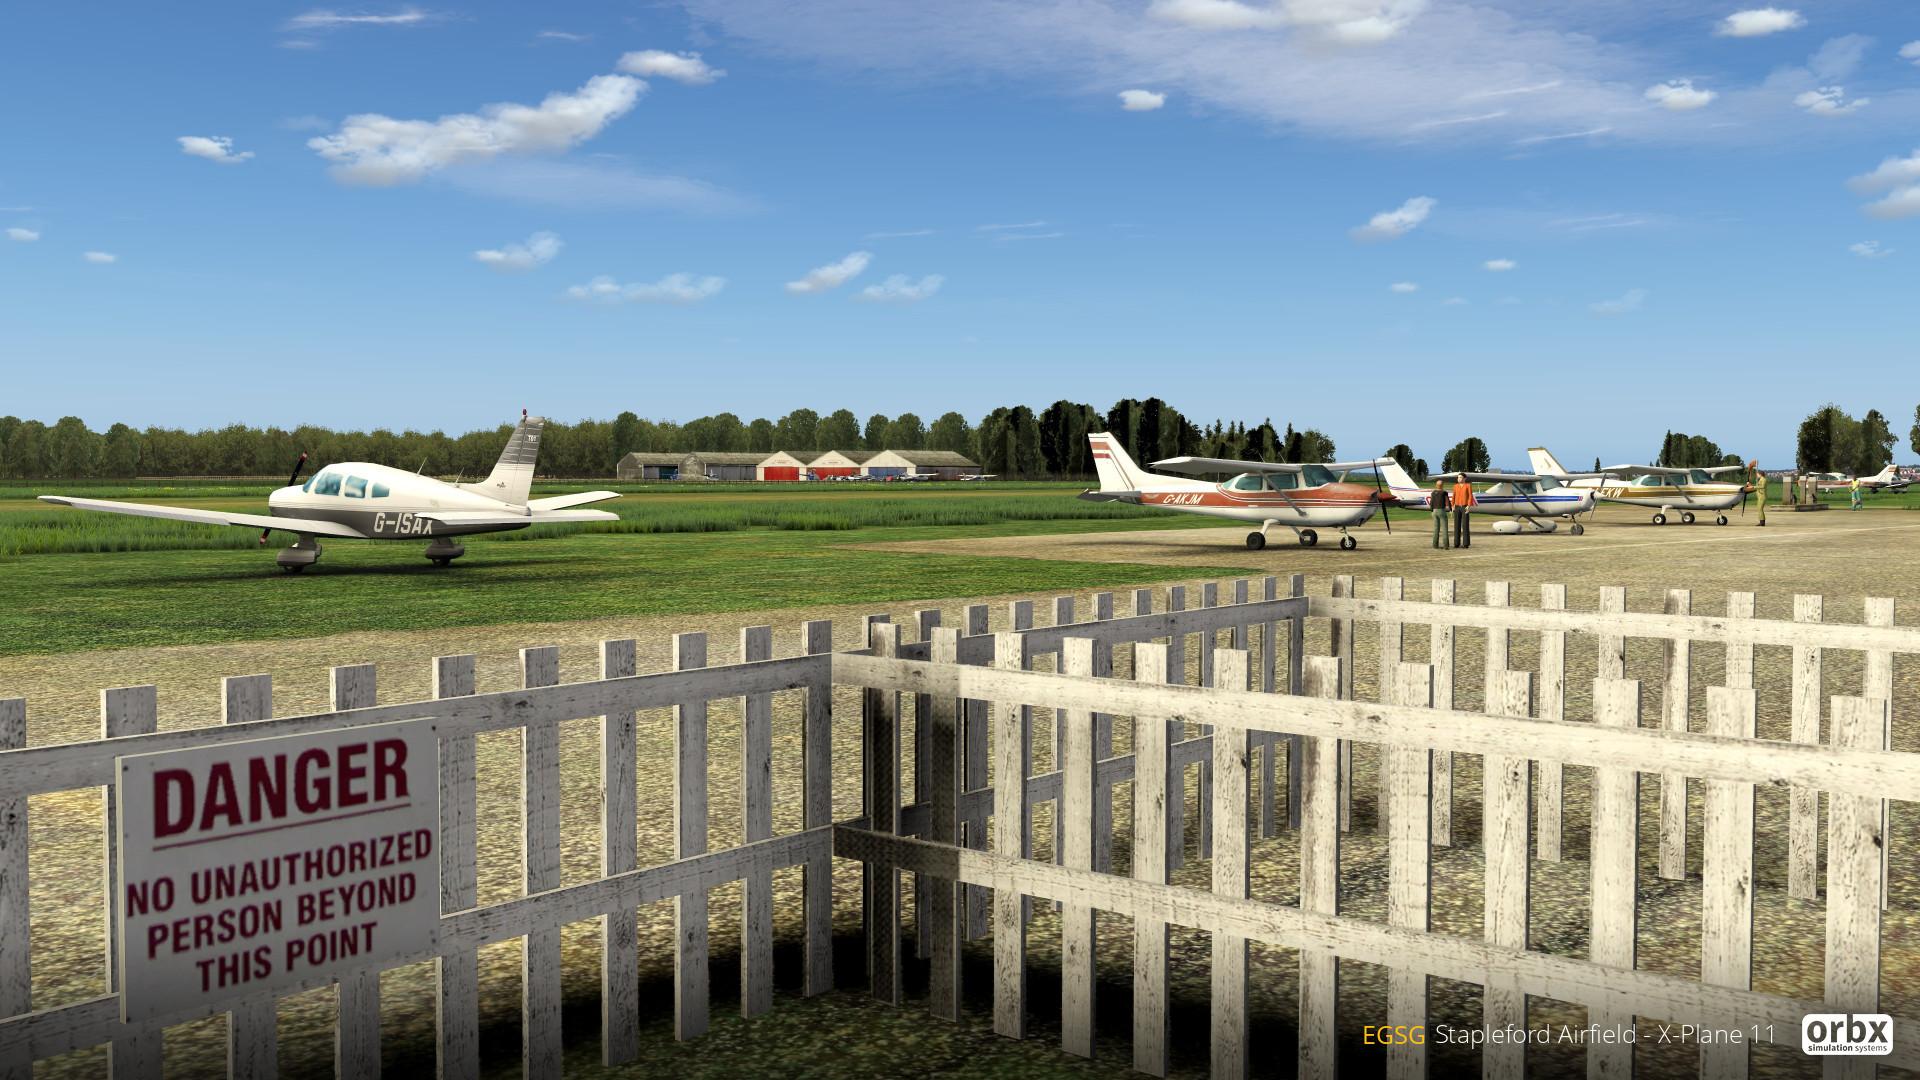 EGSG Stapleford Airfield